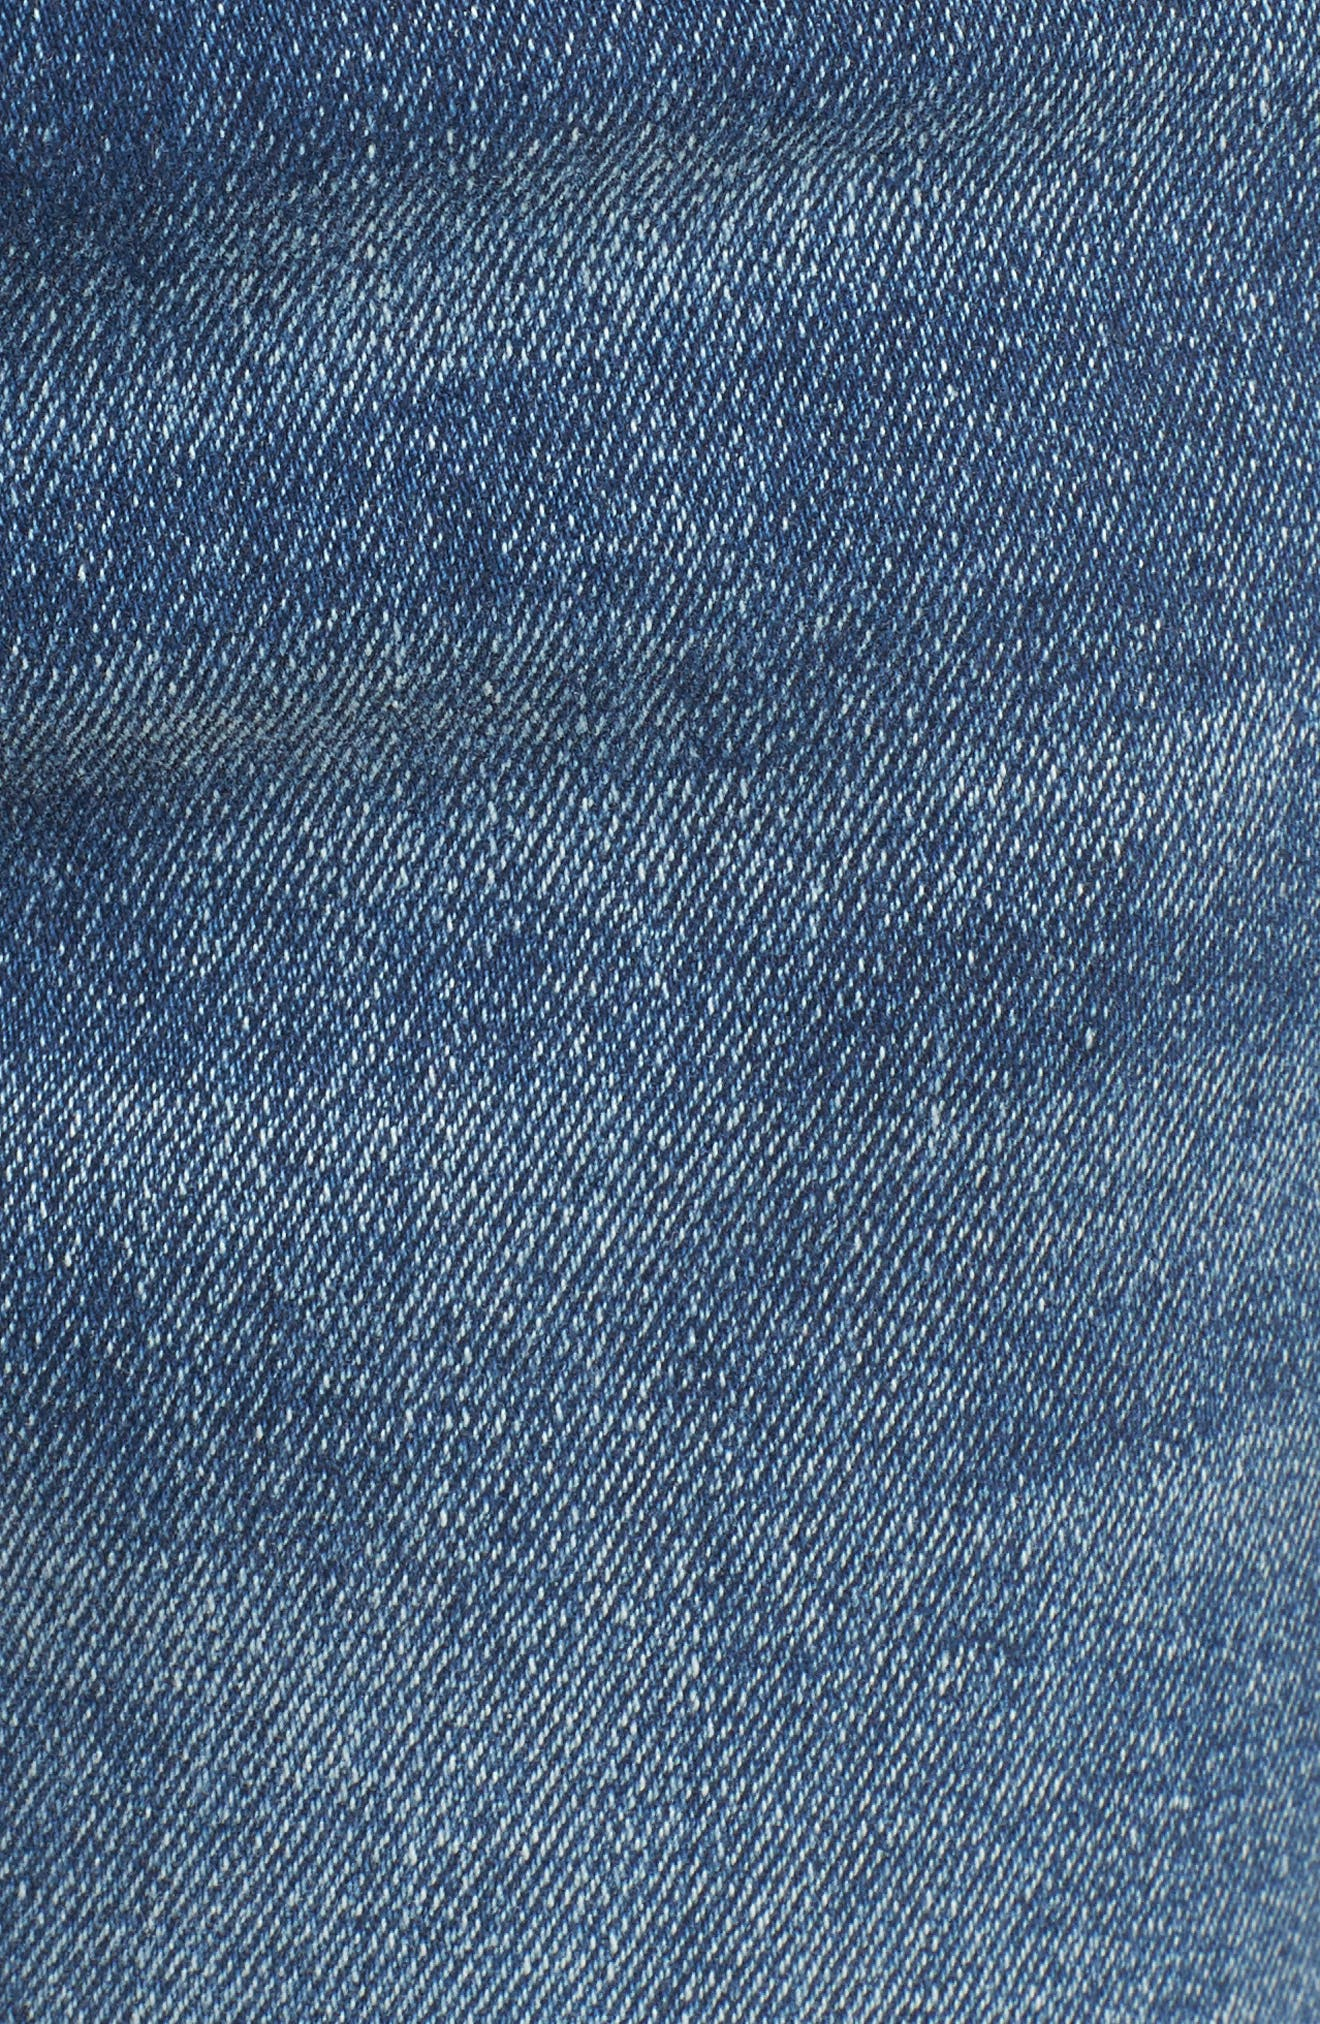 Florence Instasculpt Crop Skinny Jeans,                             Alternate thumbnail 5, color,                             400